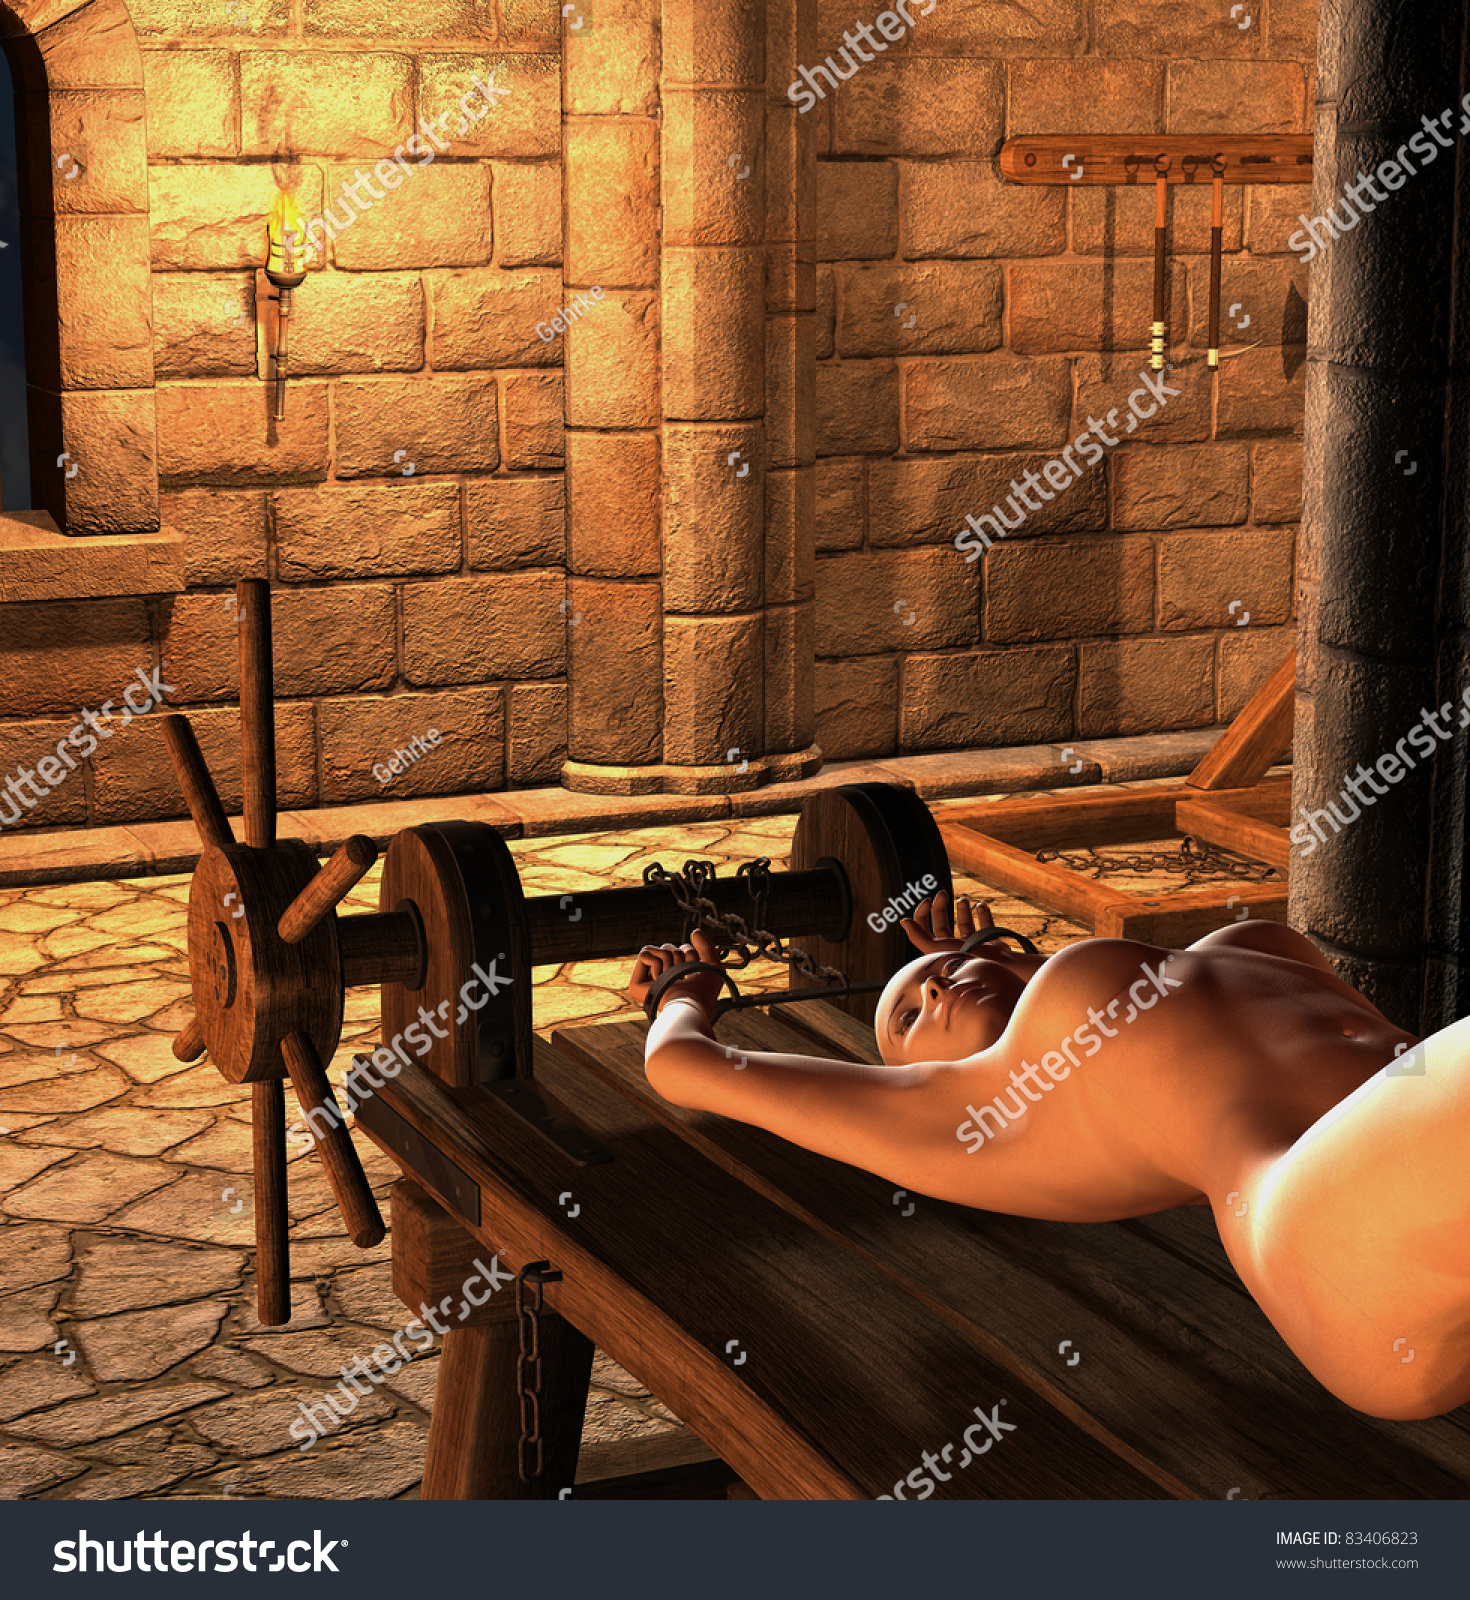 Medieval torture rack porn adult picture